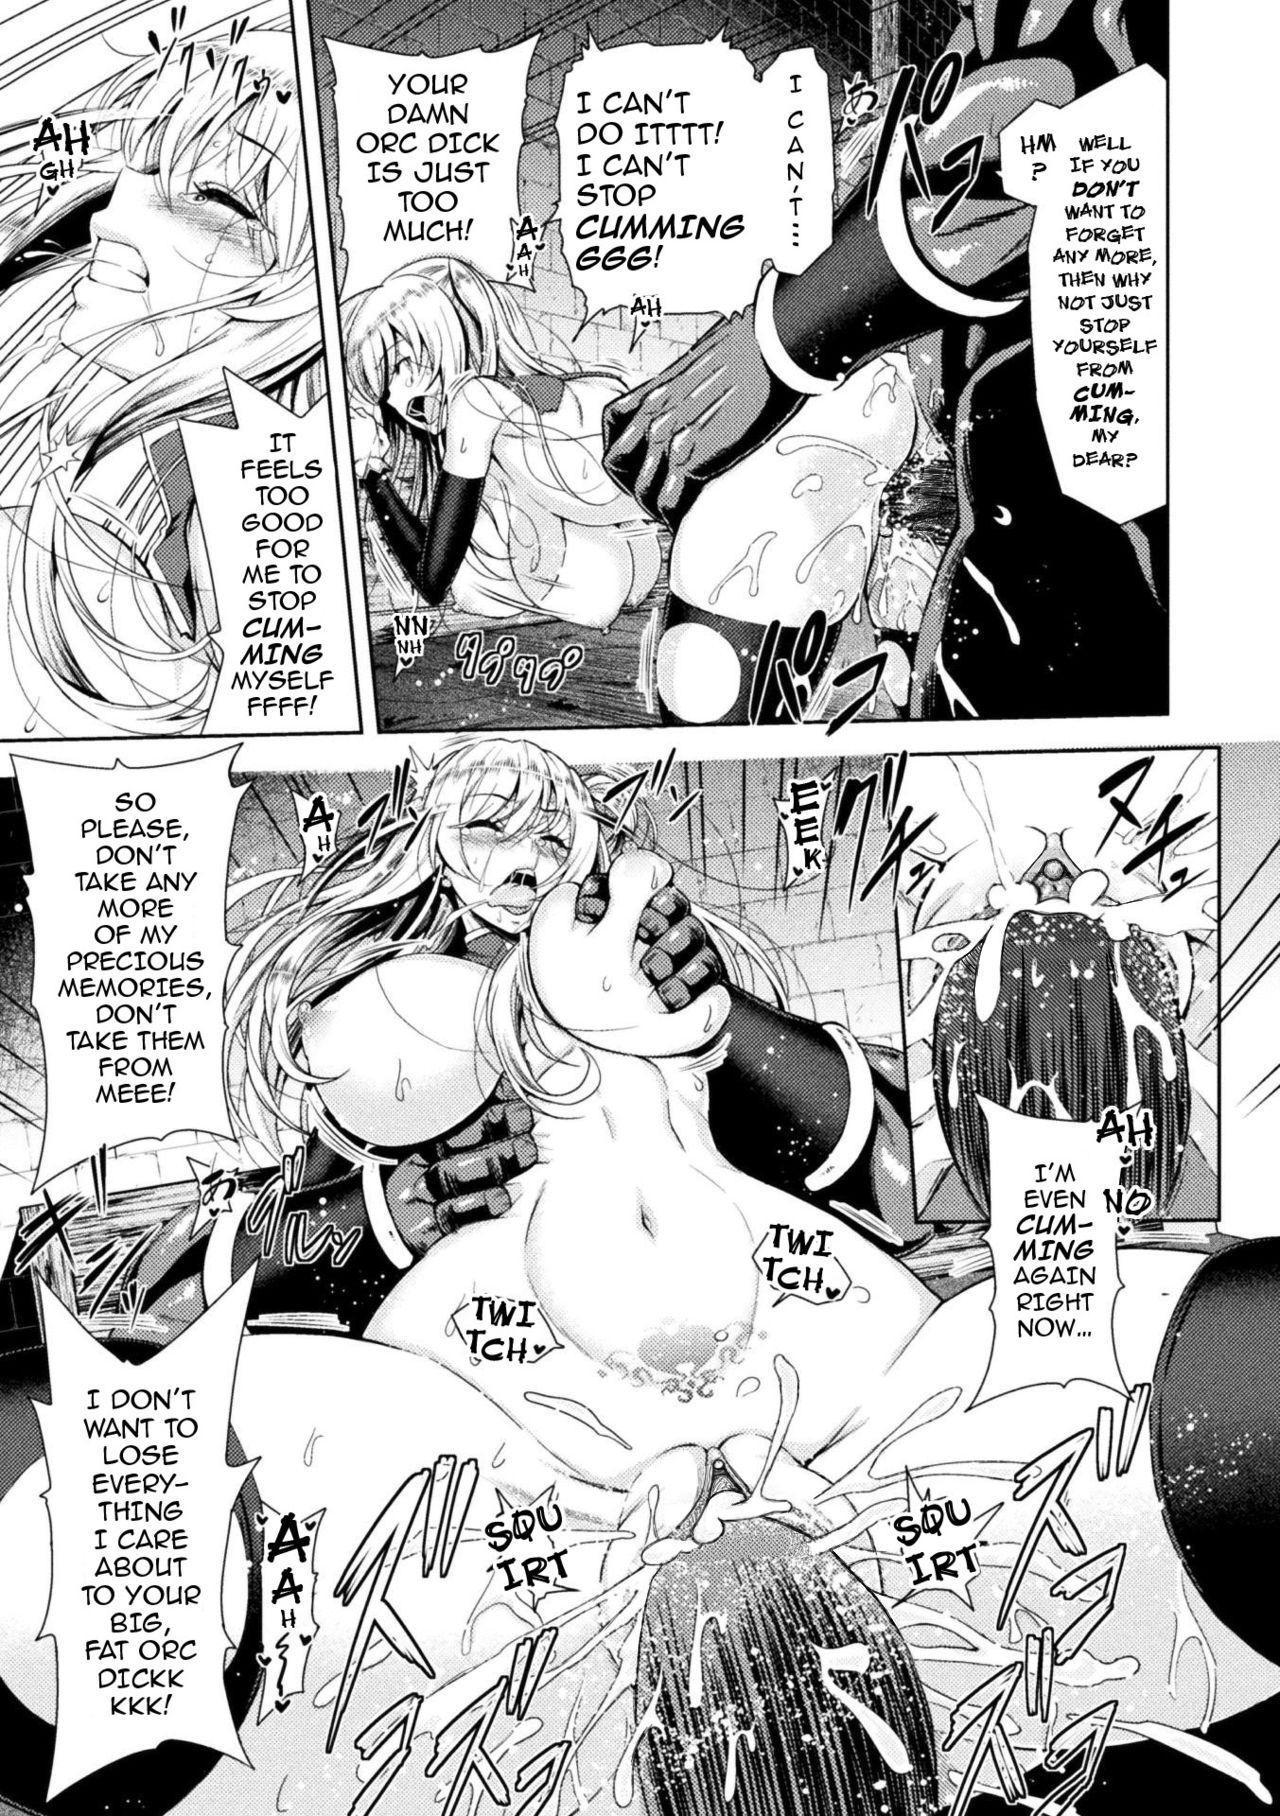 [Yamada Gogogo] Erona ~Orc no Inmon ni Okasareta Onna Kishi no Matsuro~ | Erona ~The Fall of a Beautiful Knight Cursed with the Lewd Mark of an Orc~ Ch. 1-6 [English] [darknight] [Decensored] [ongoing] 44